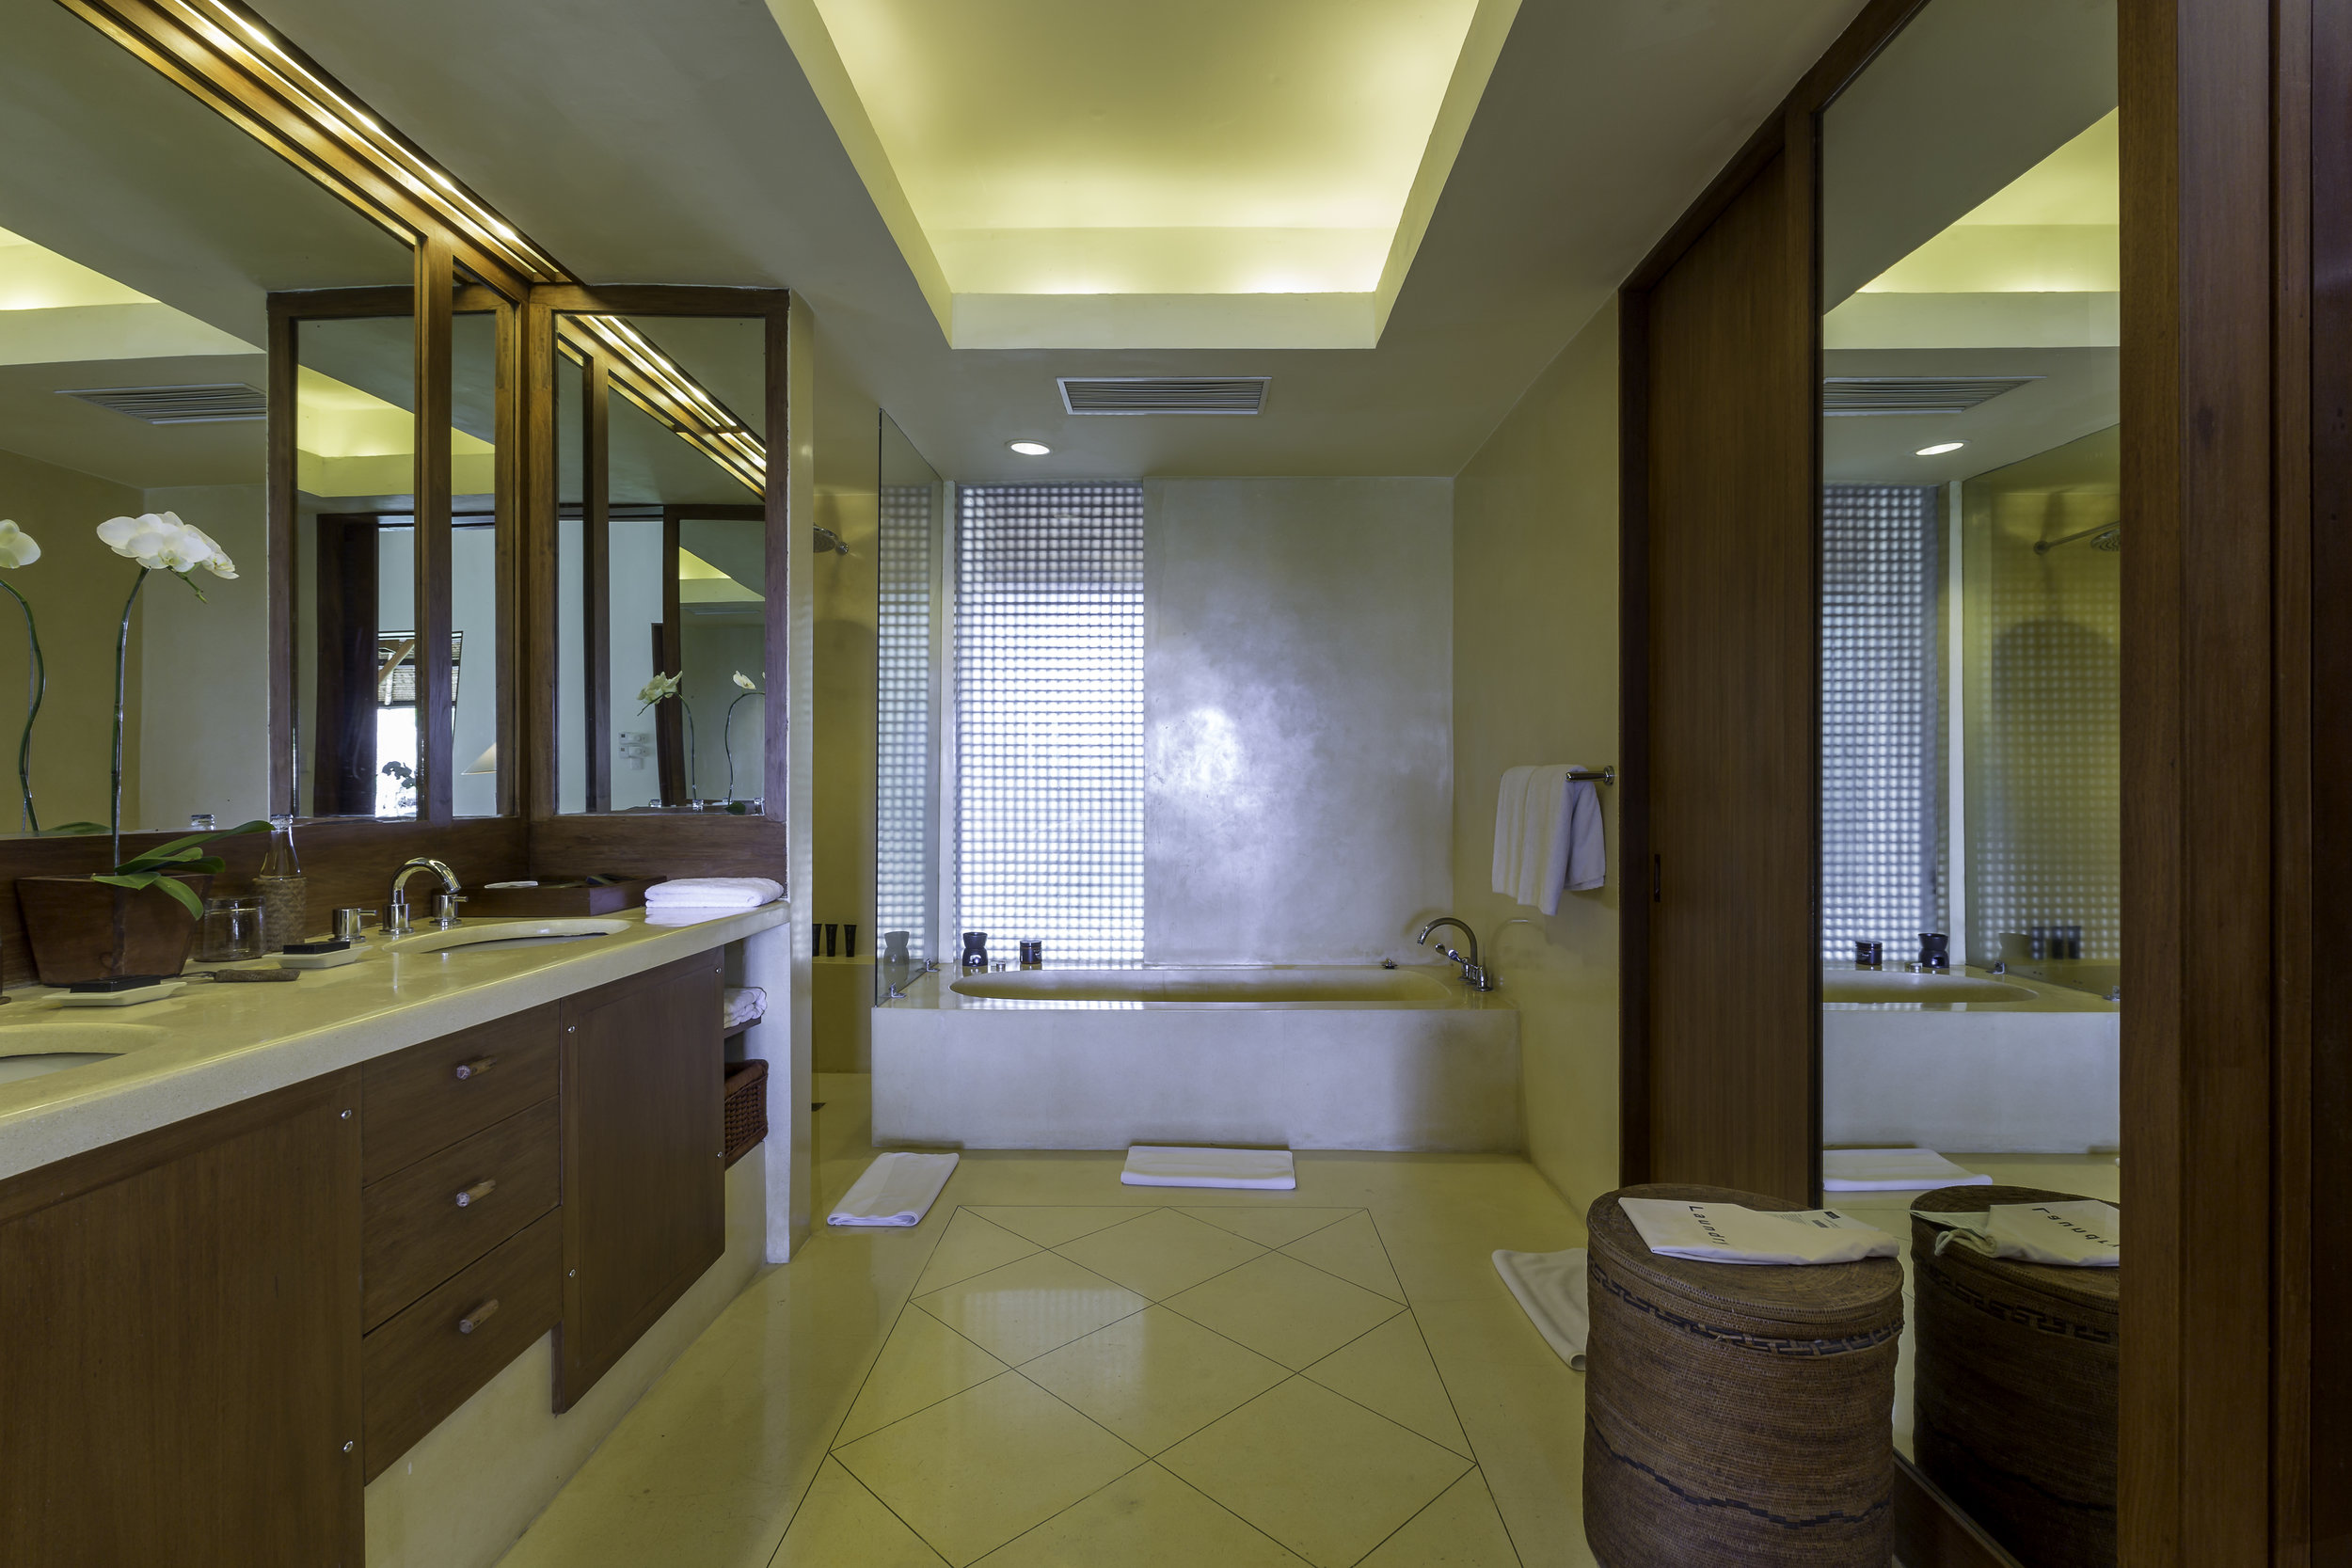 Alila Manggis - Accommodation - Seaside Suite Bathroom.jpg